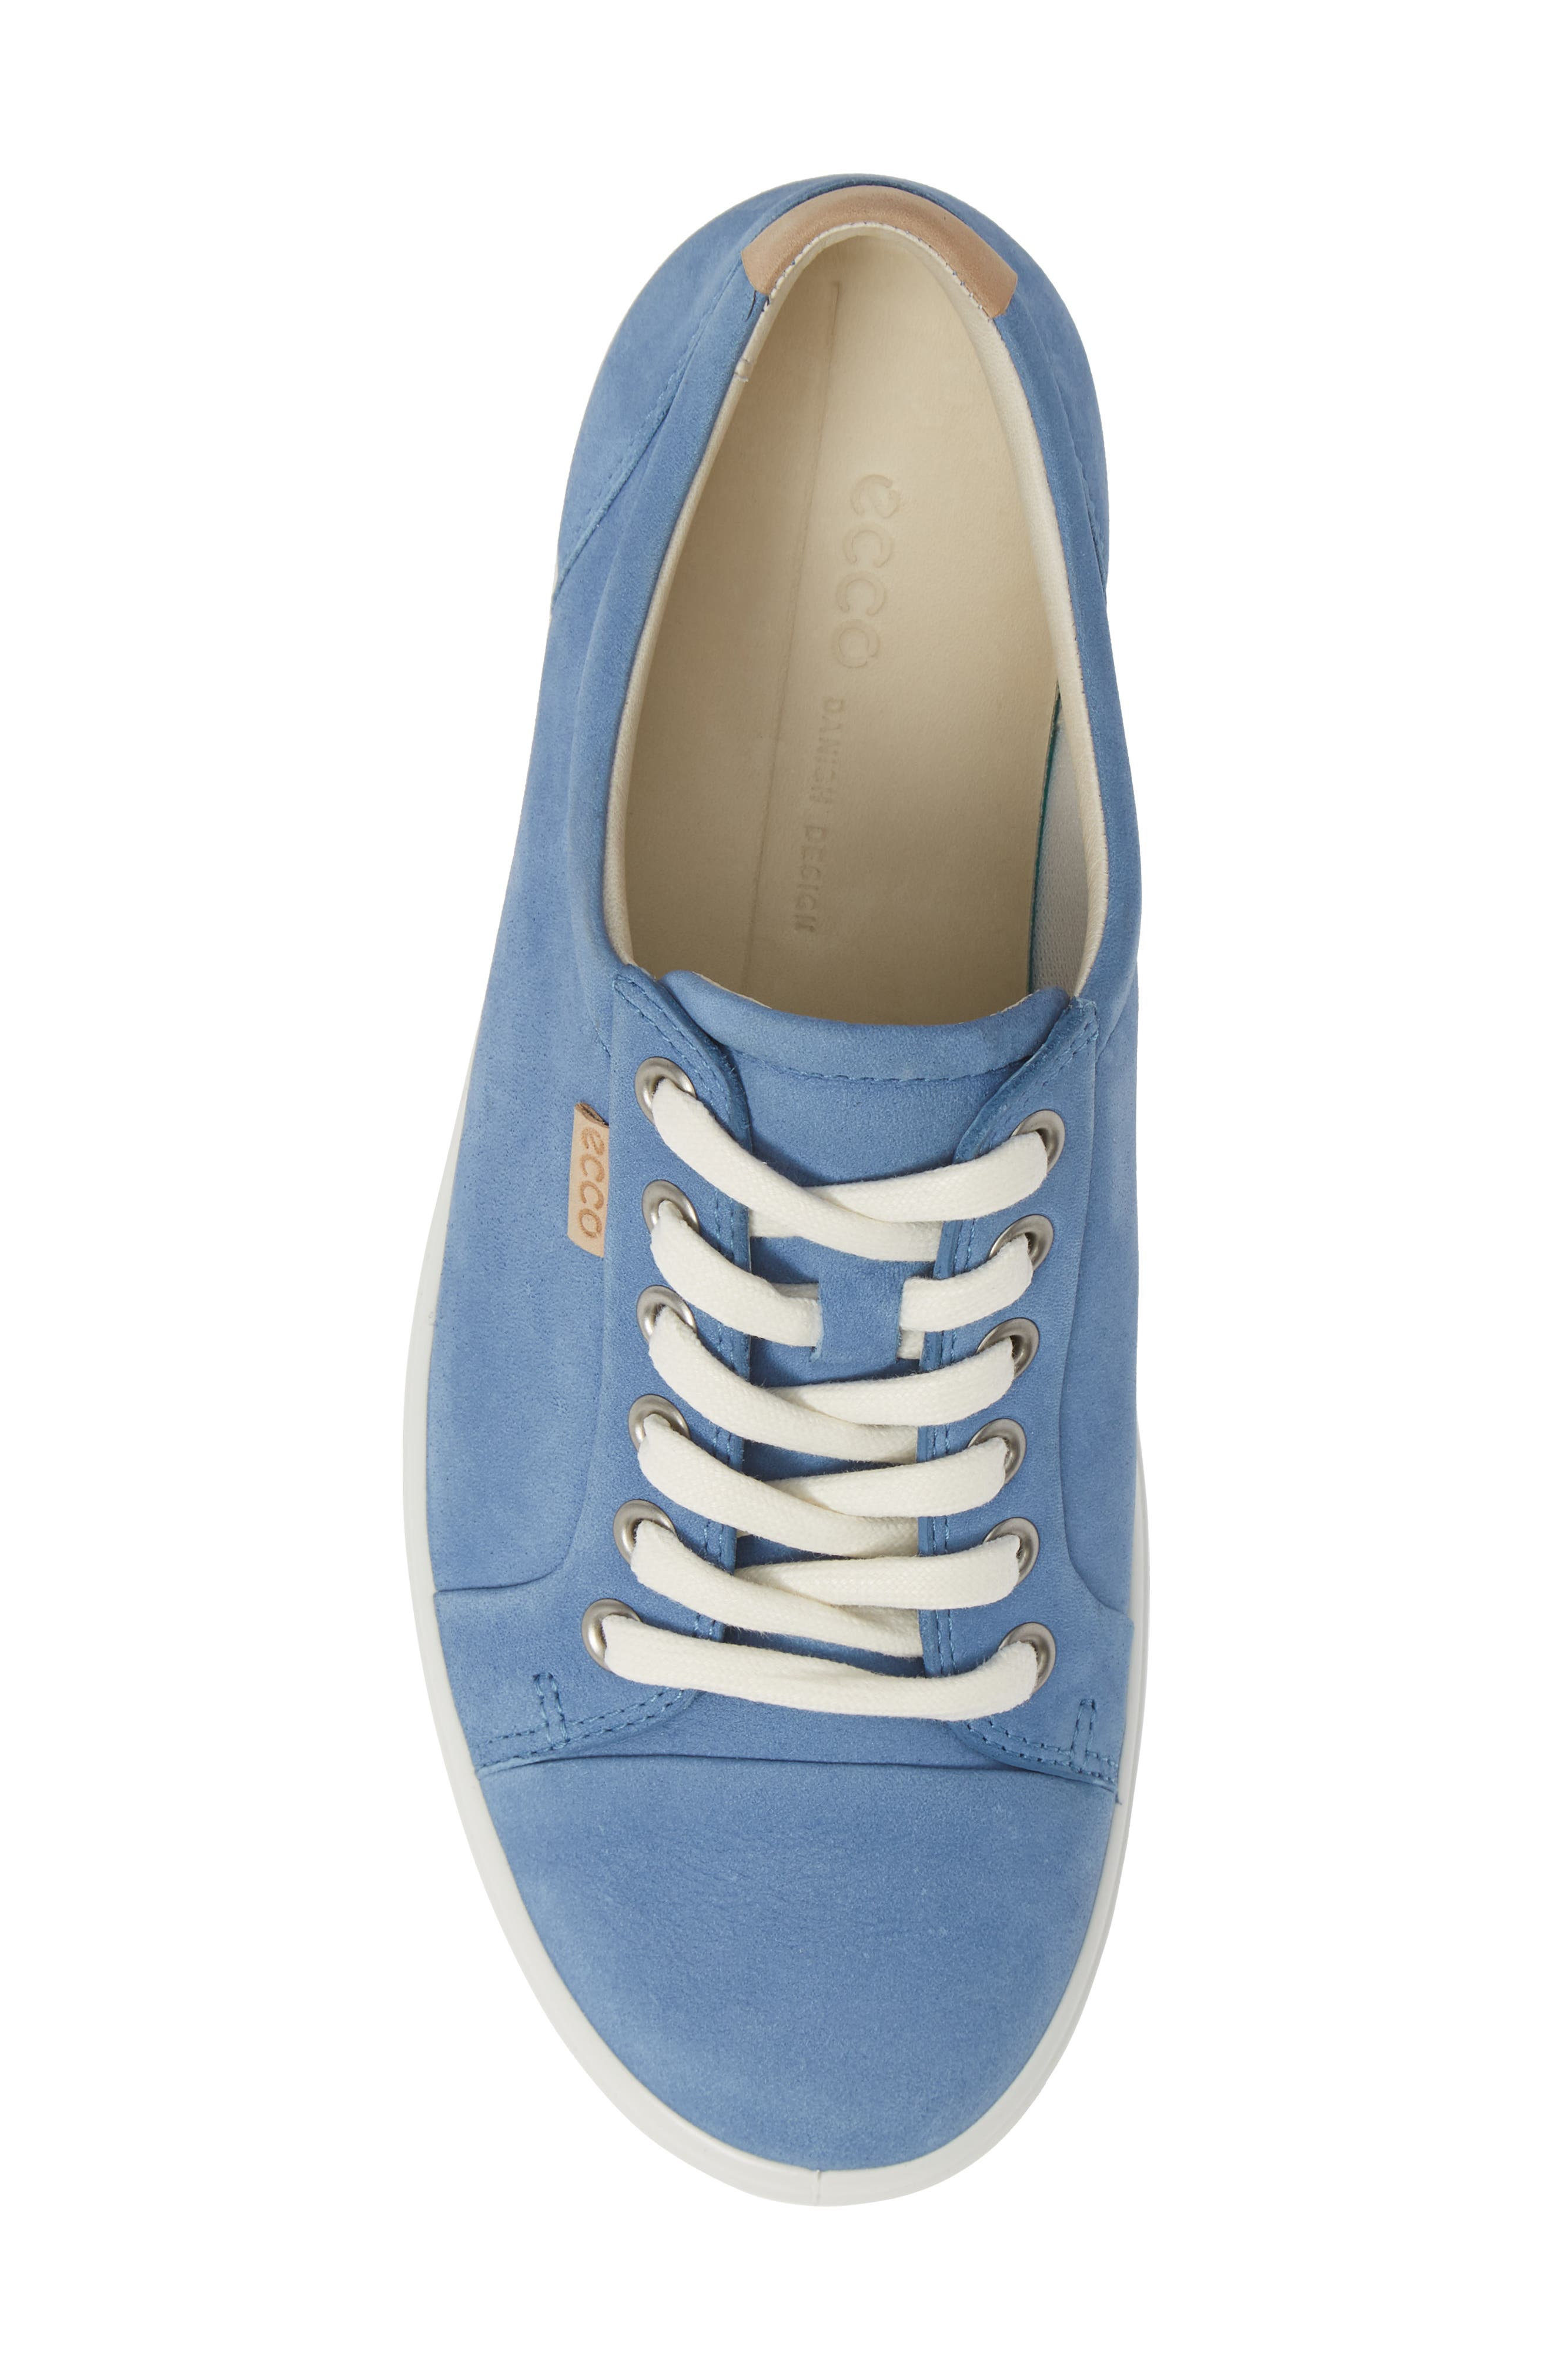 Soft 7 Sneaker,                             Alternate thumbnail 5, color,                             RETRO BLUE LEATHER